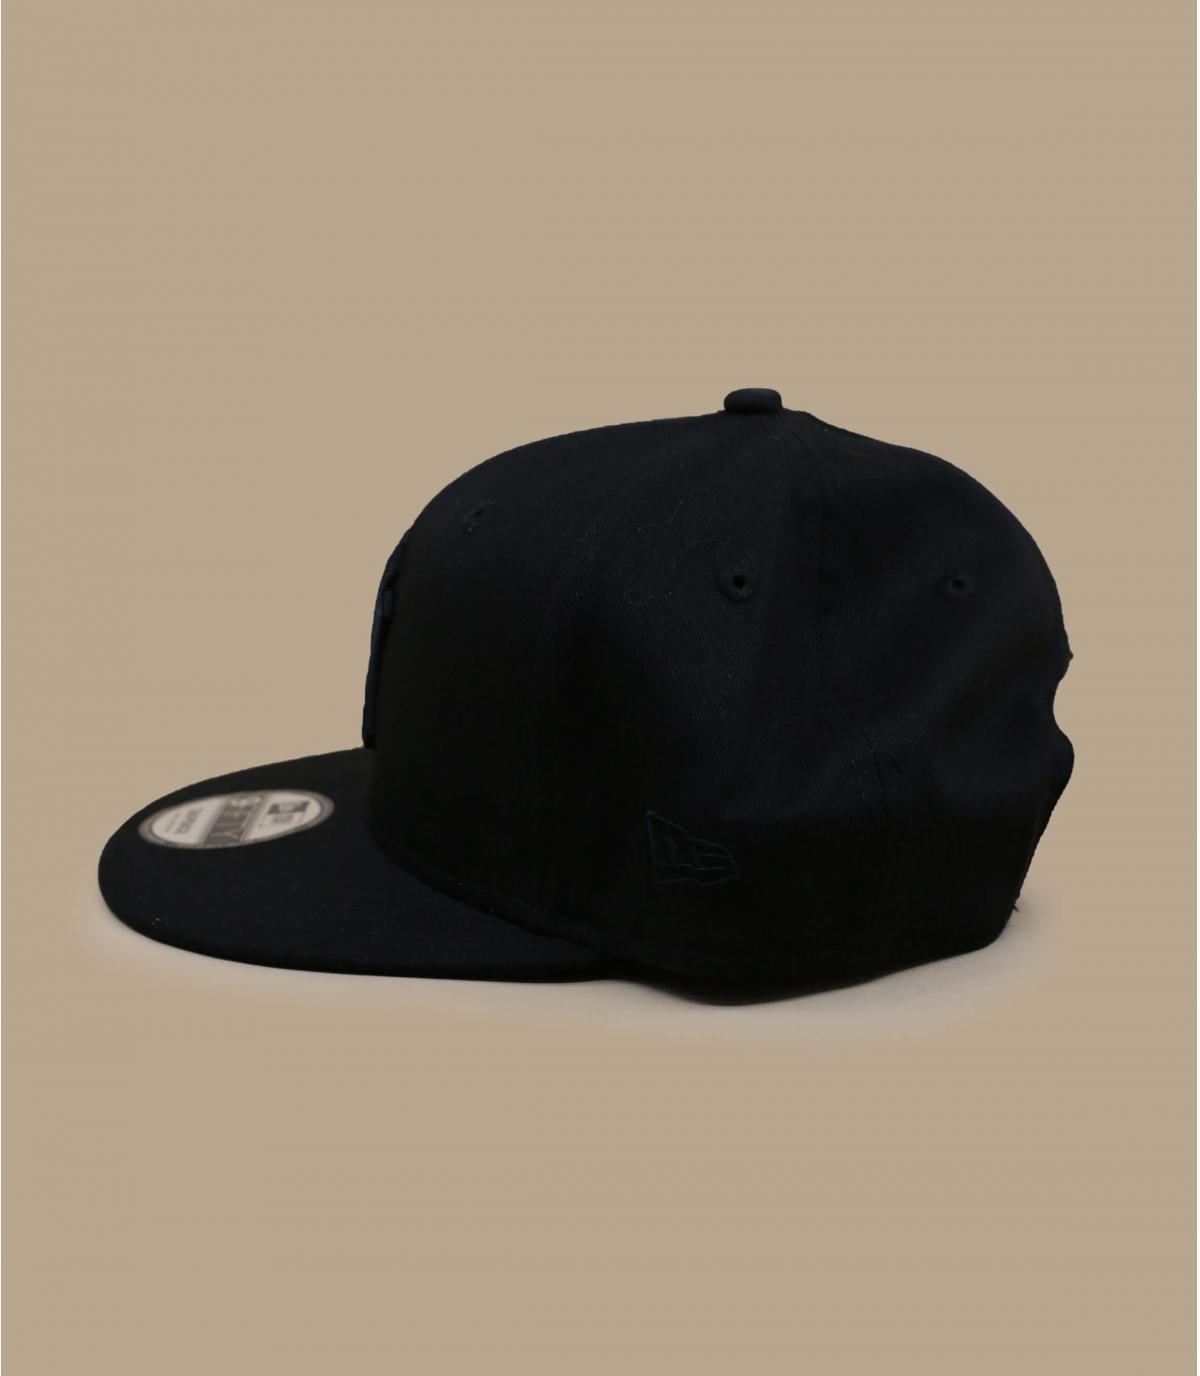 Détails Snapback NY MLB black black - image 3